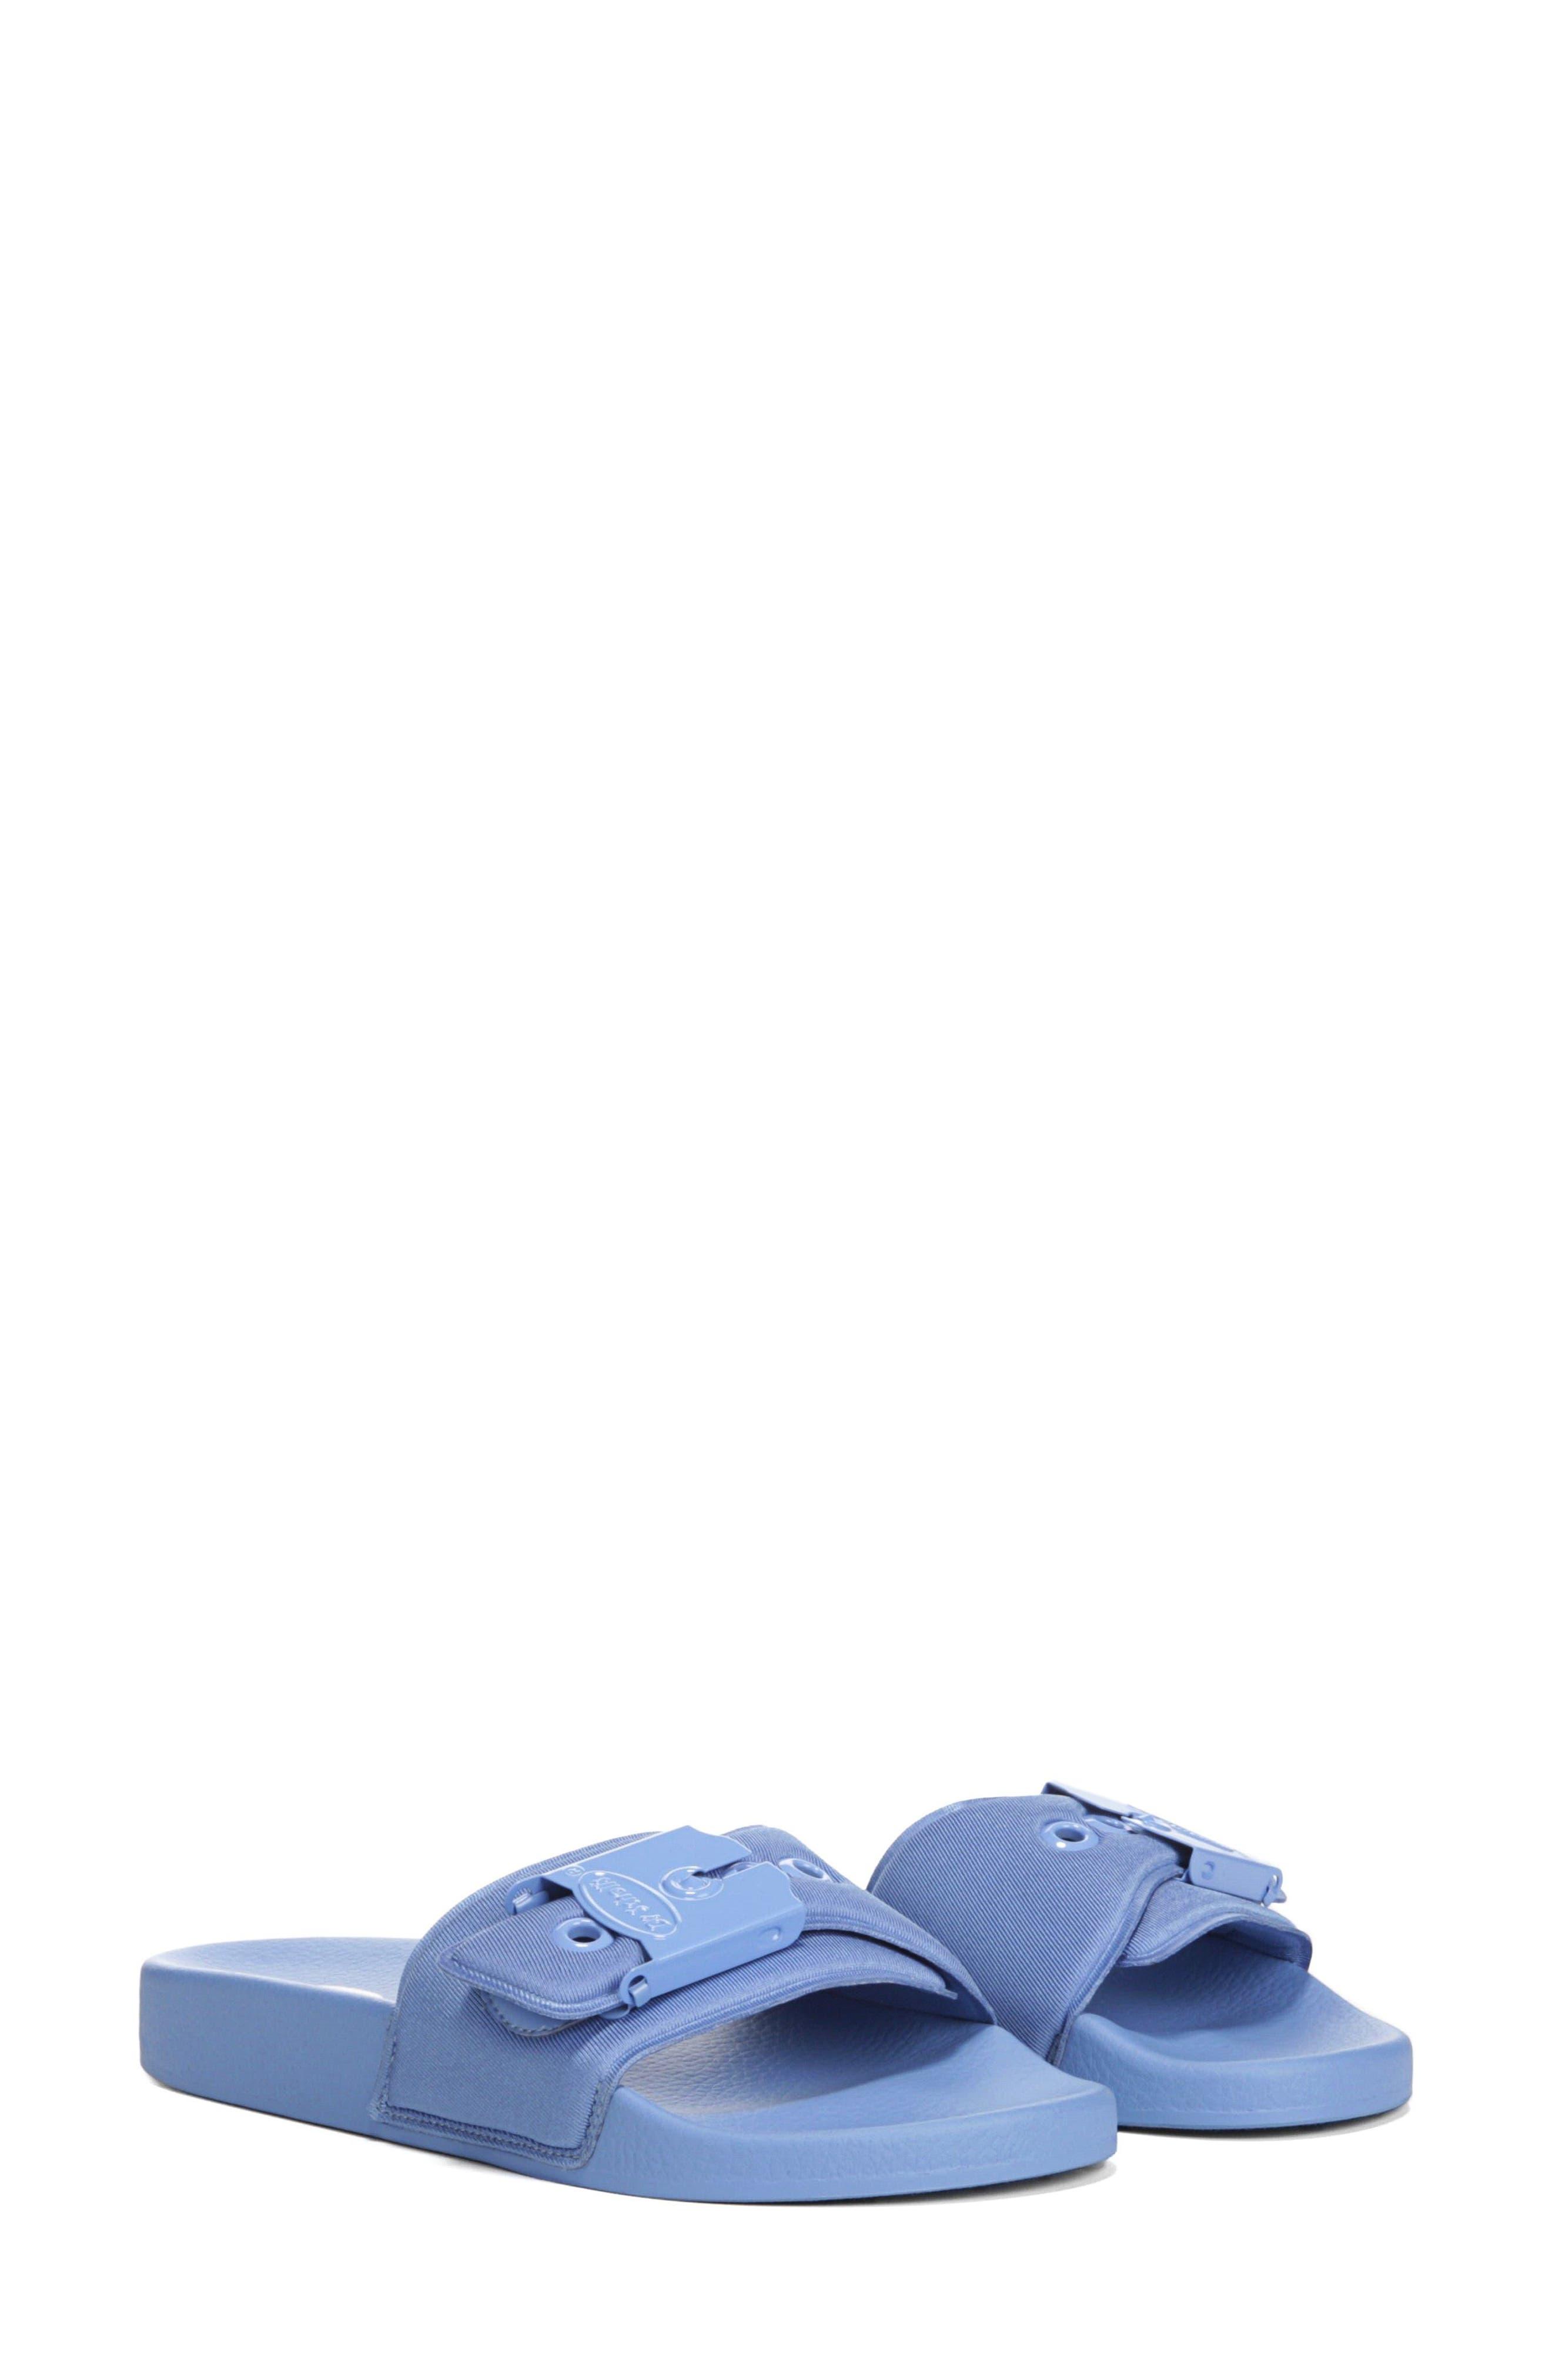 Original Pool Slide Sandal,                             Alternate thumbnail 6, color,                             BLUE